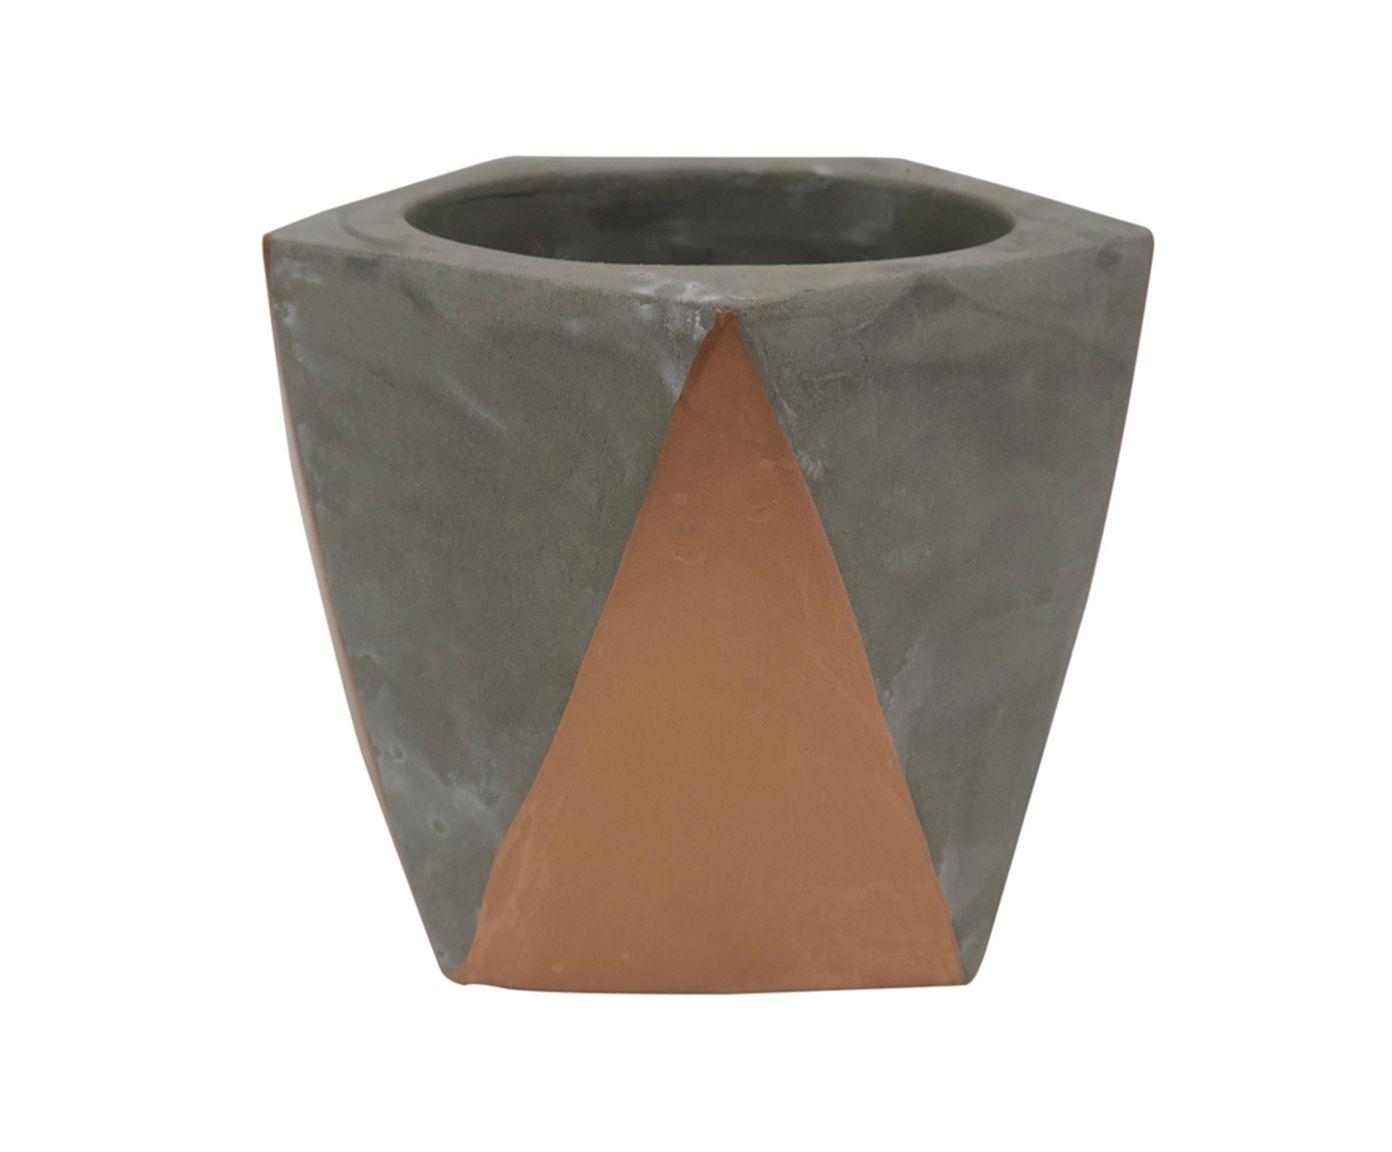 Cachepot Ozanan Gazpa Acobreado - 8,5cm | Westwing.com.br